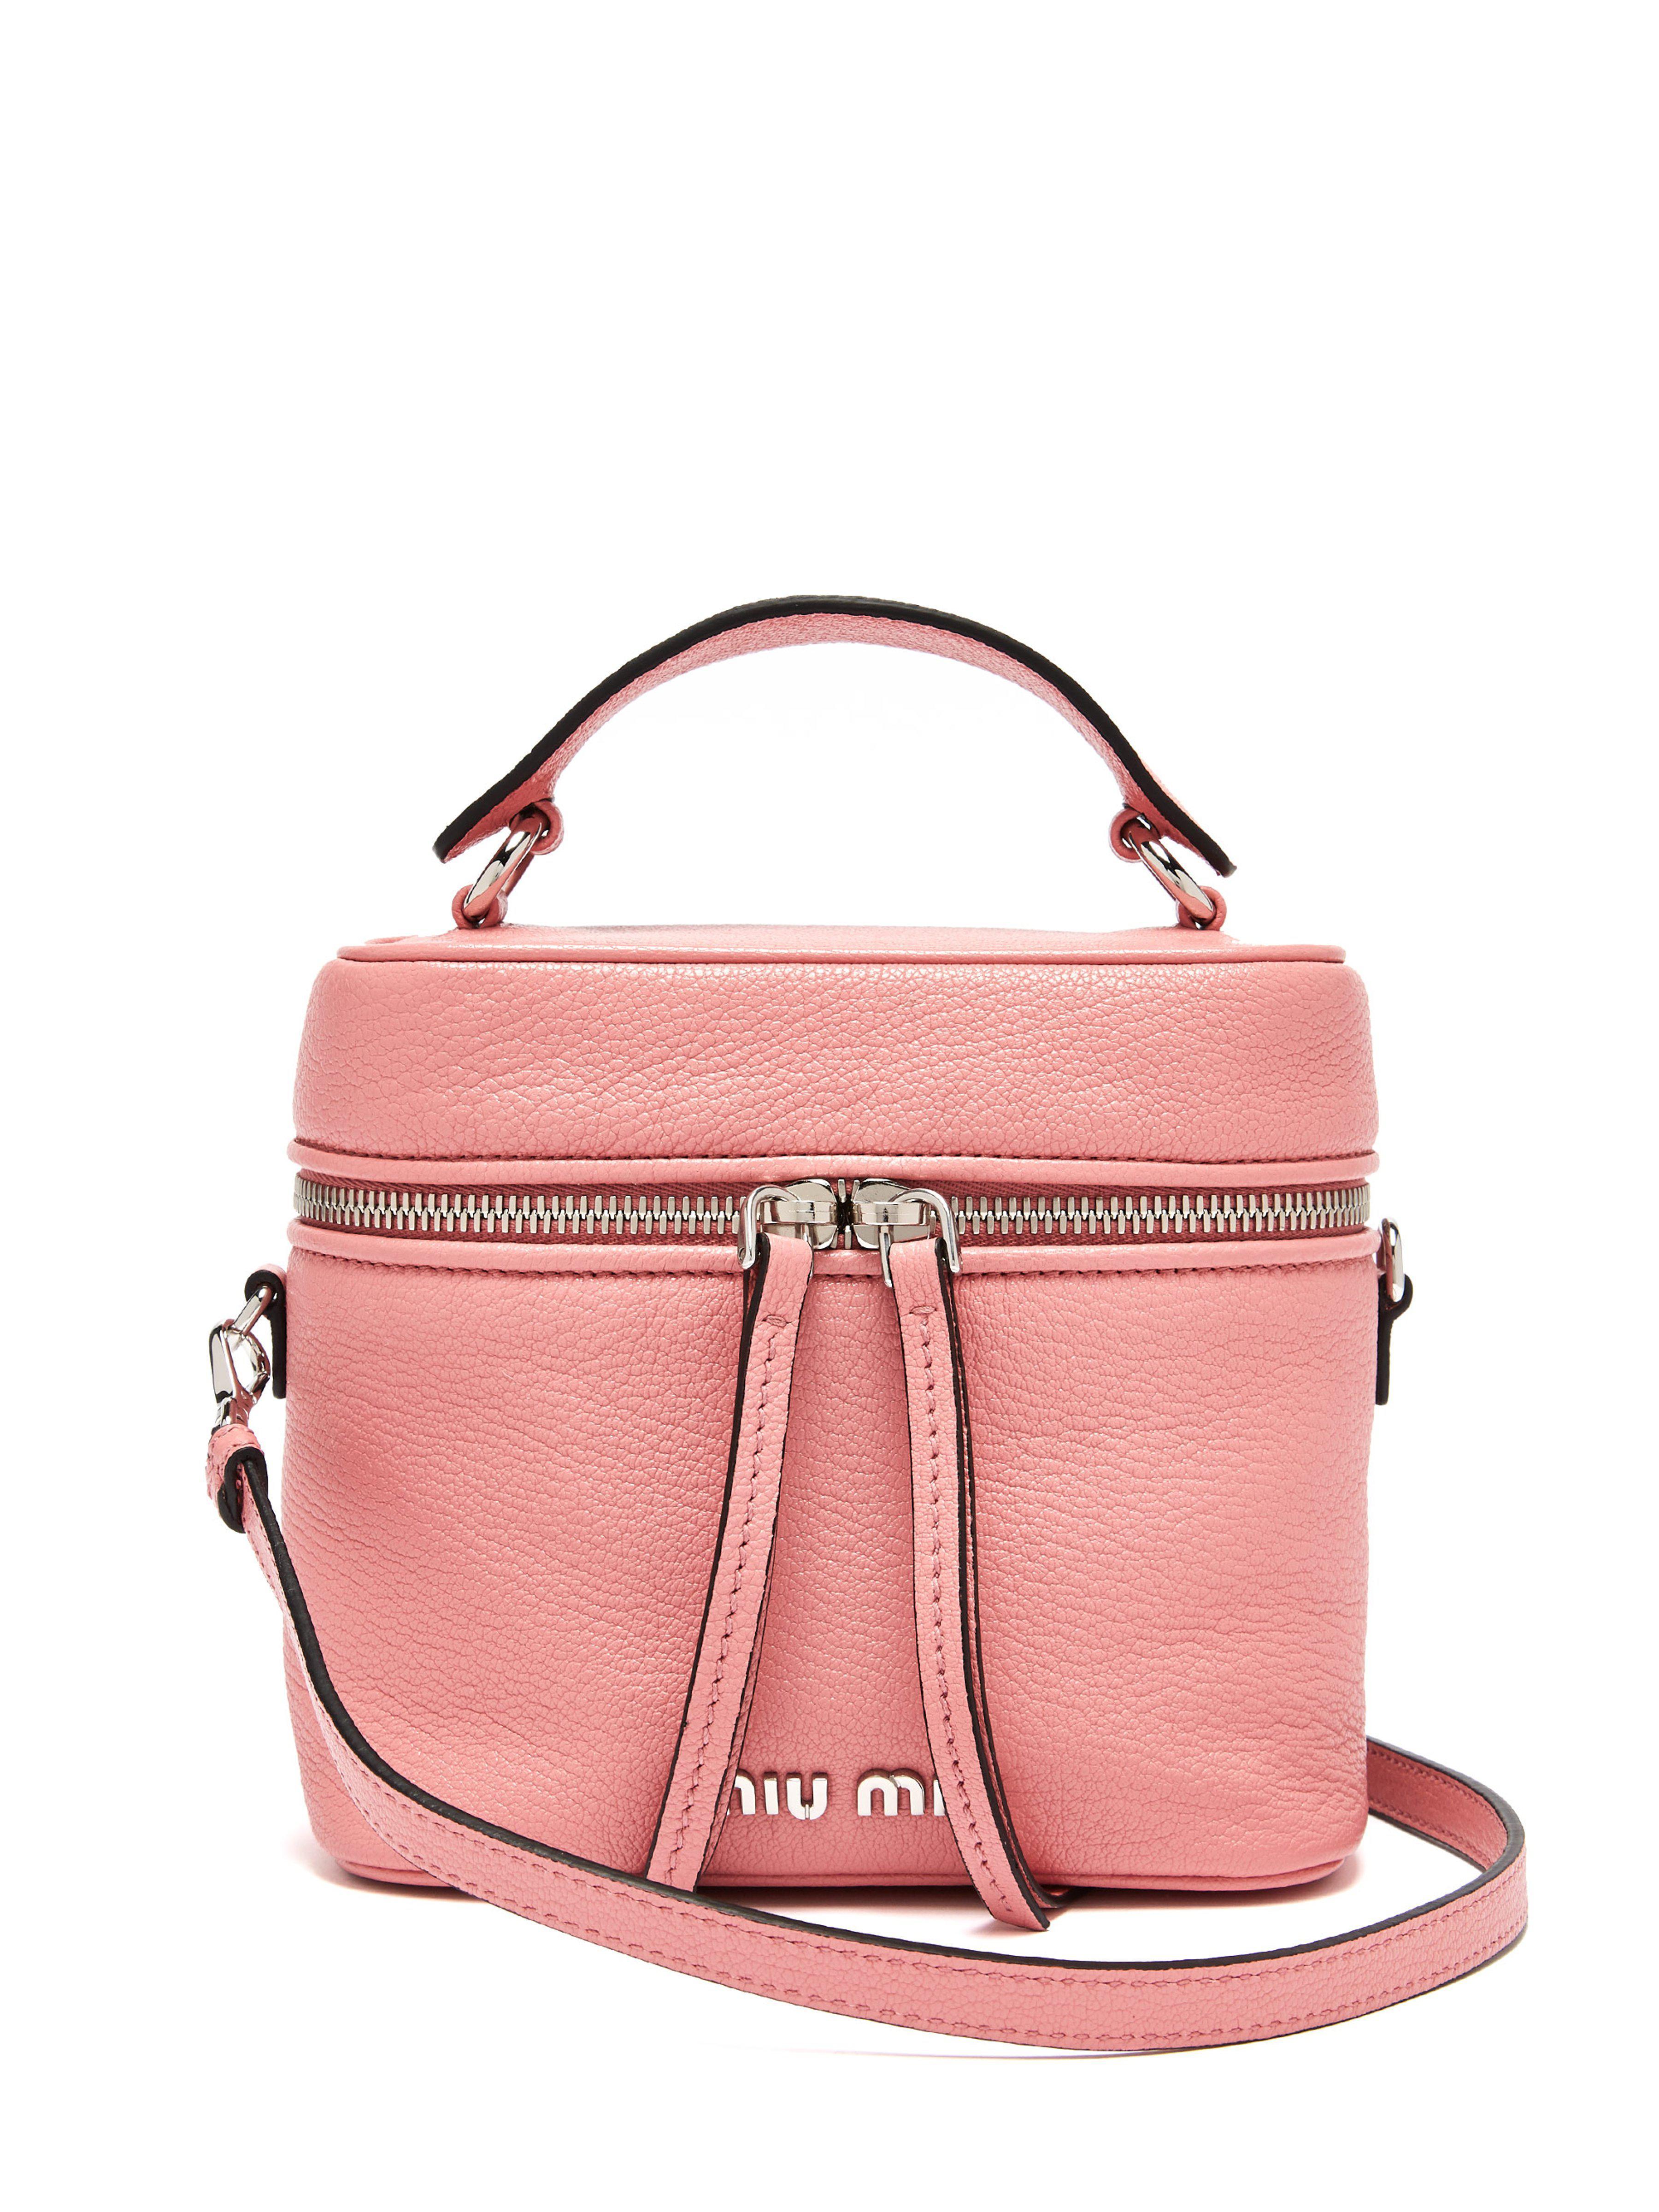 f290aa527c8b Miu Miu Leather Cross Body Beauty Case in Pink - Lyst